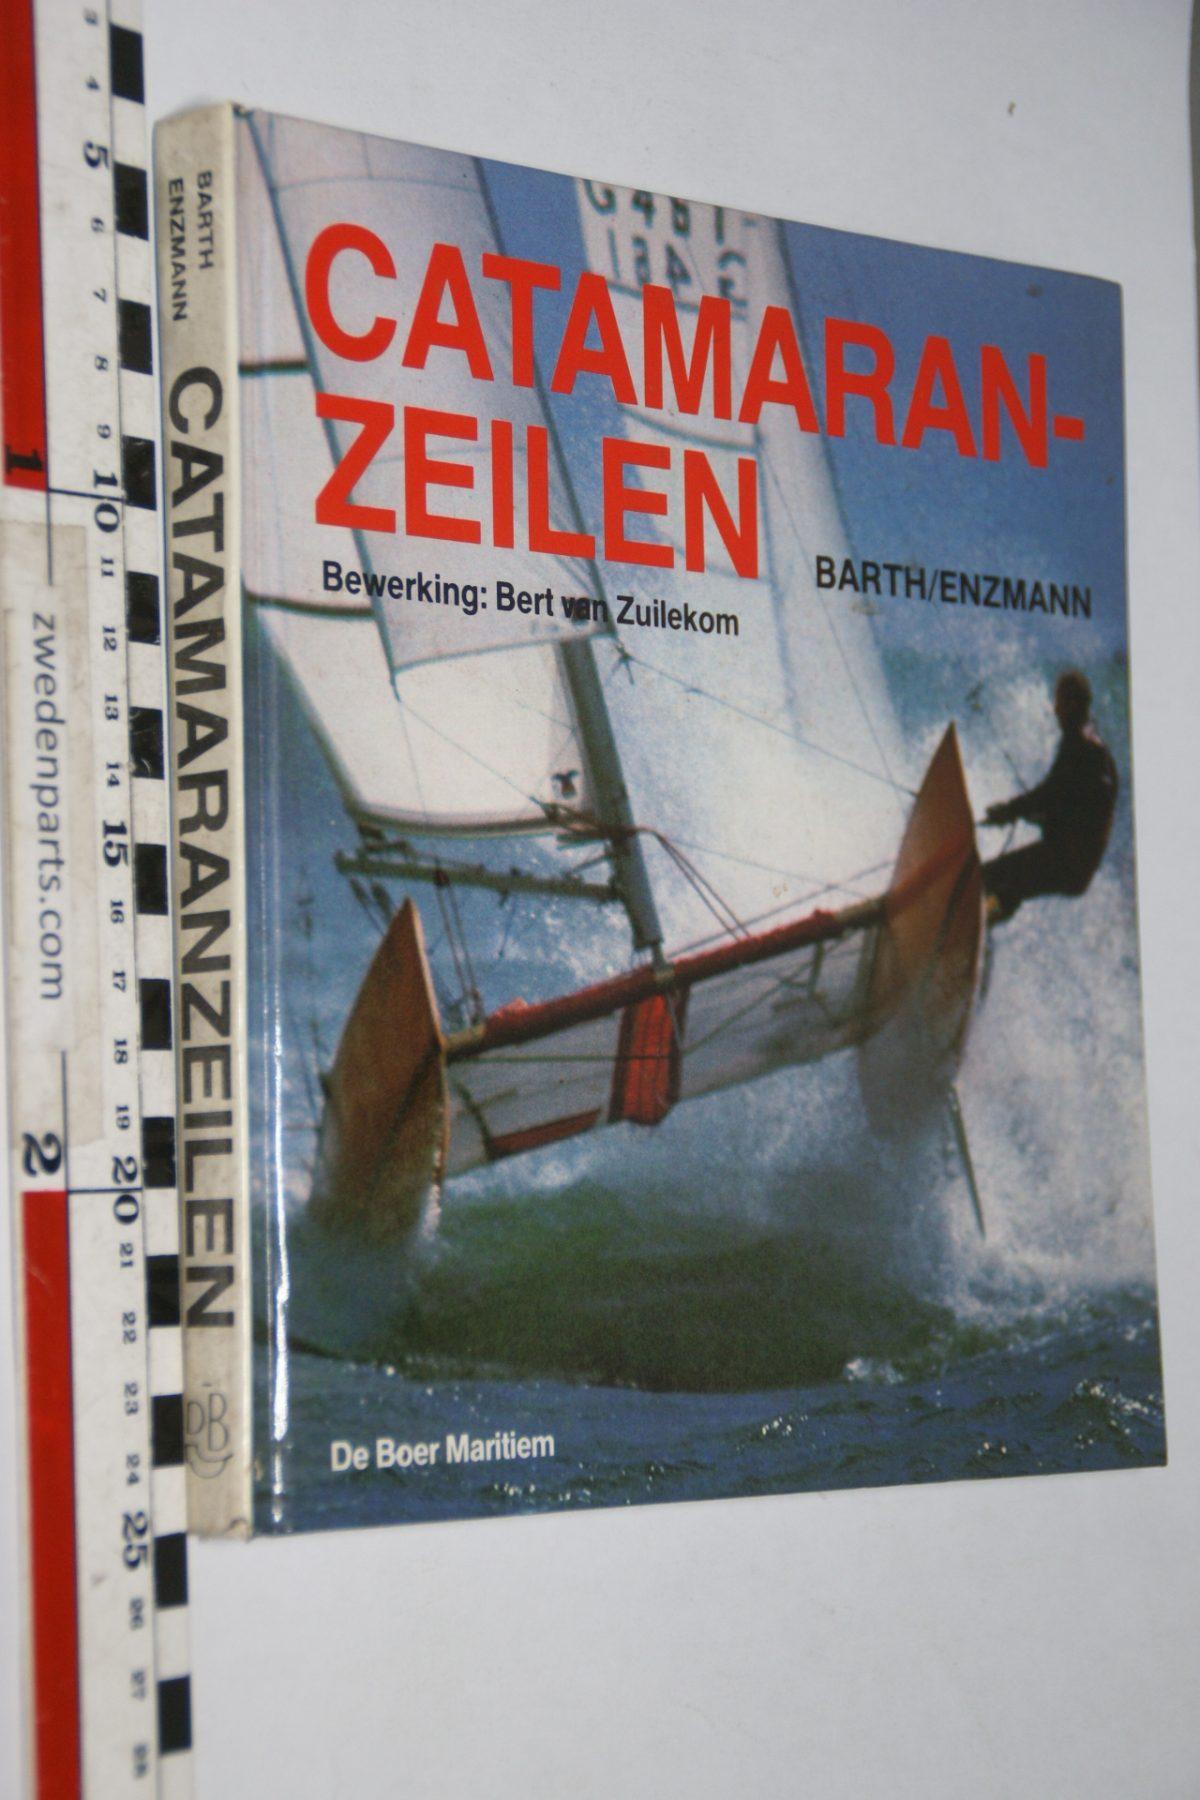 DSC06926 1982 boek Catamaran zeilen van Barth-Enzmann  ISBN 90228129499